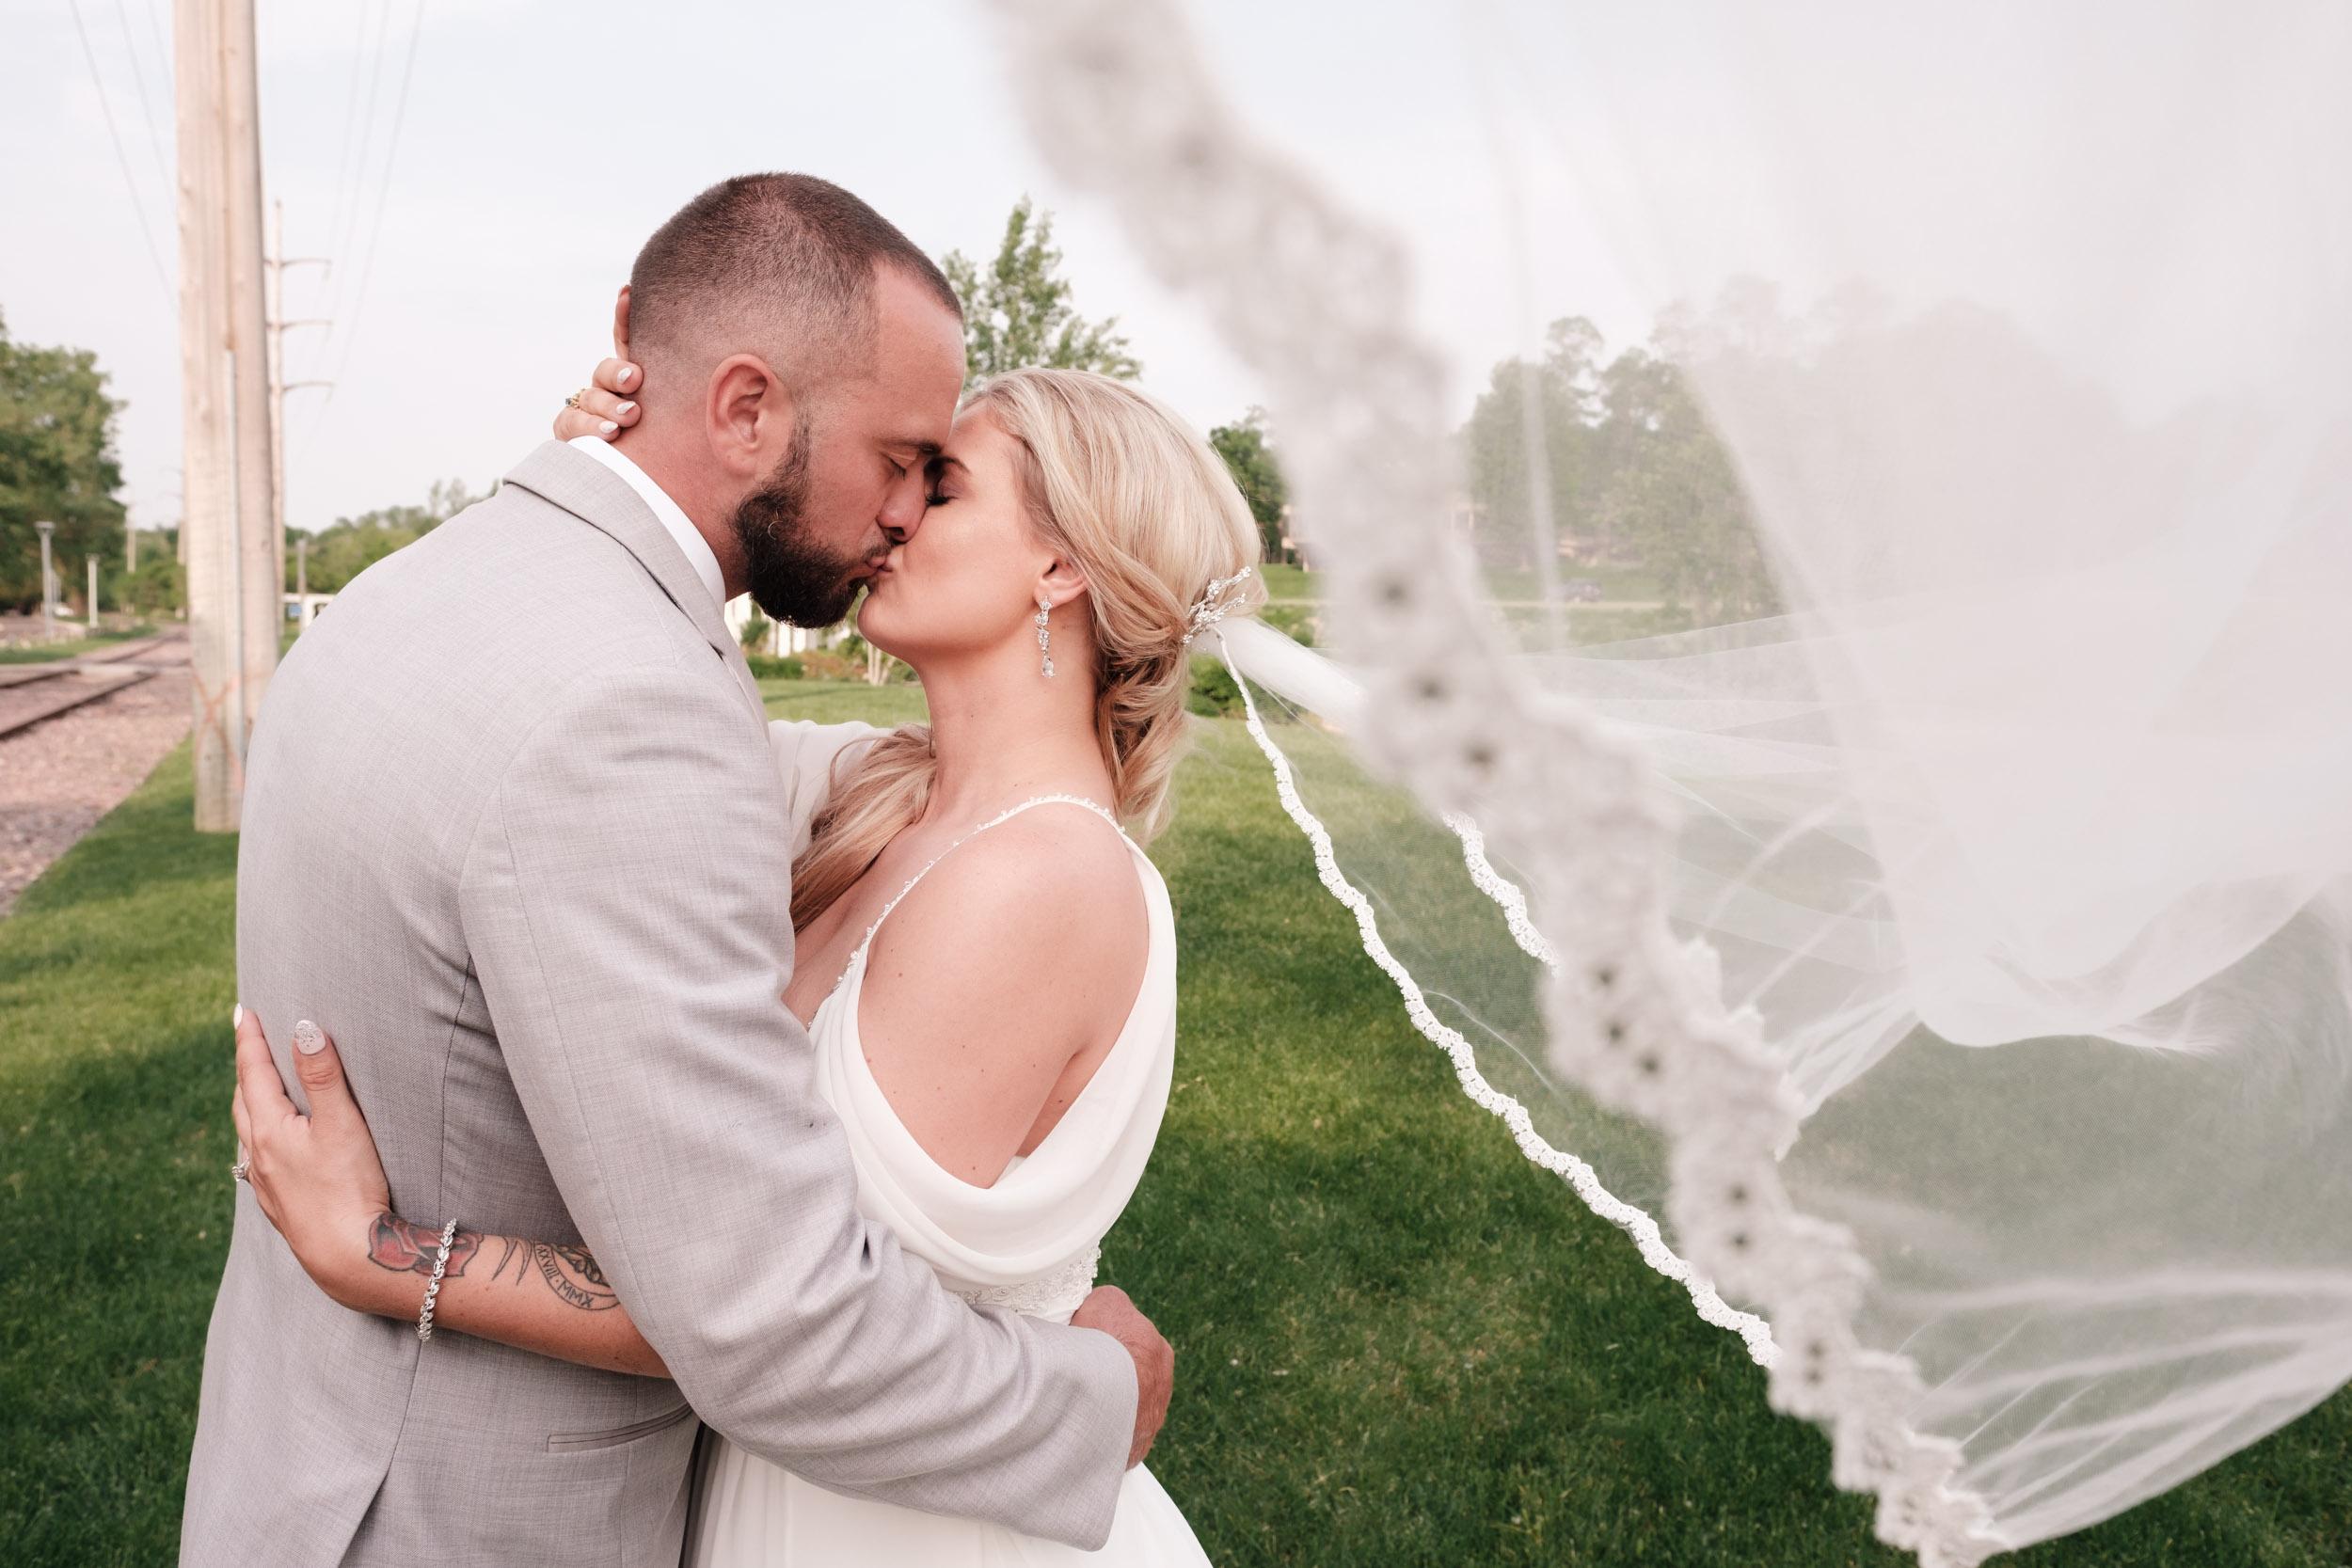 19-06-01 Megan Josh - Nicholas Conservatory Wedding-51.jpg